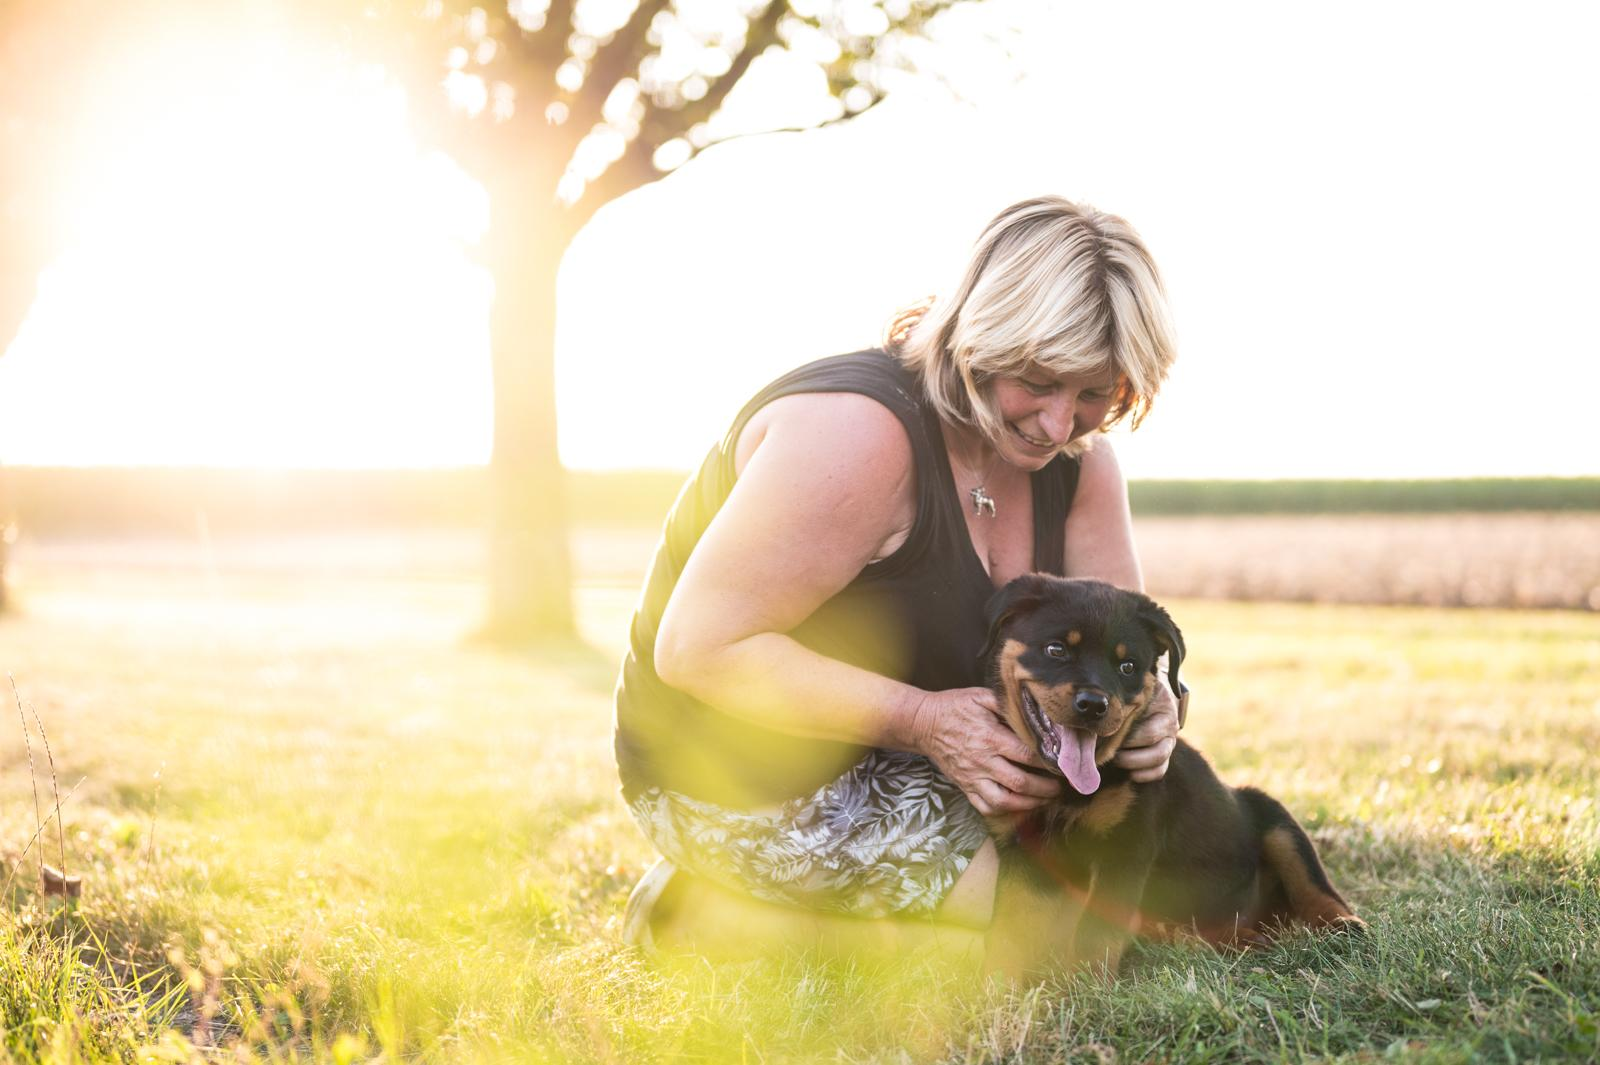 Tierfotograf-Labrador-Sven's Bildwerke-Hund-Hundefotografie2